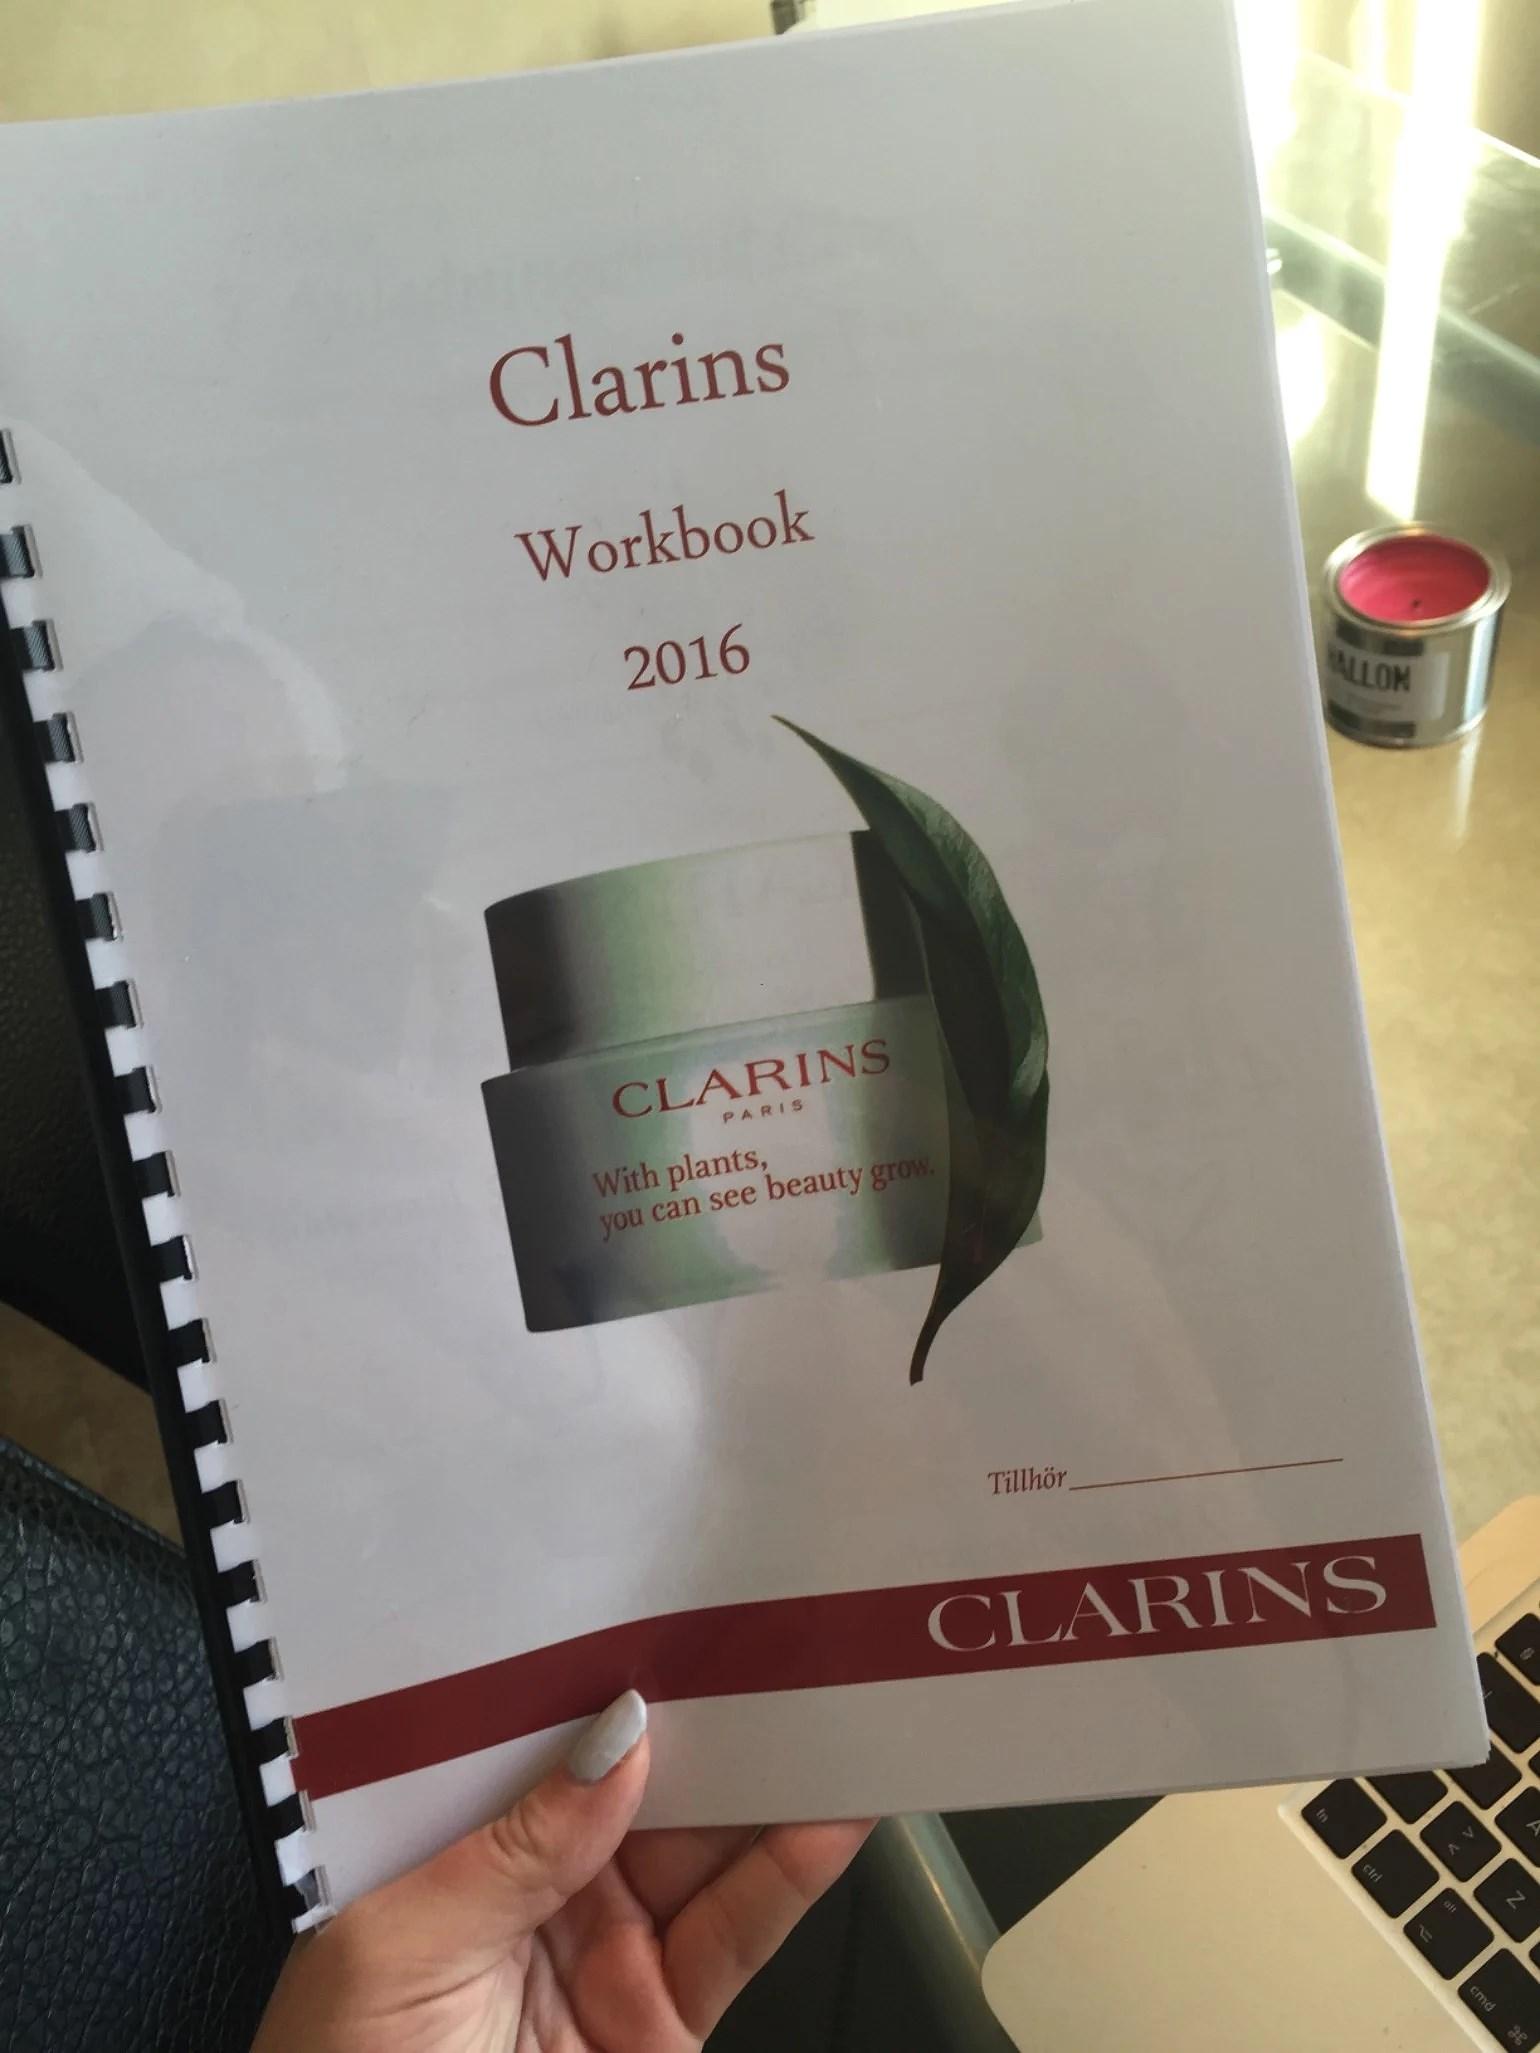 Clarins utbildning